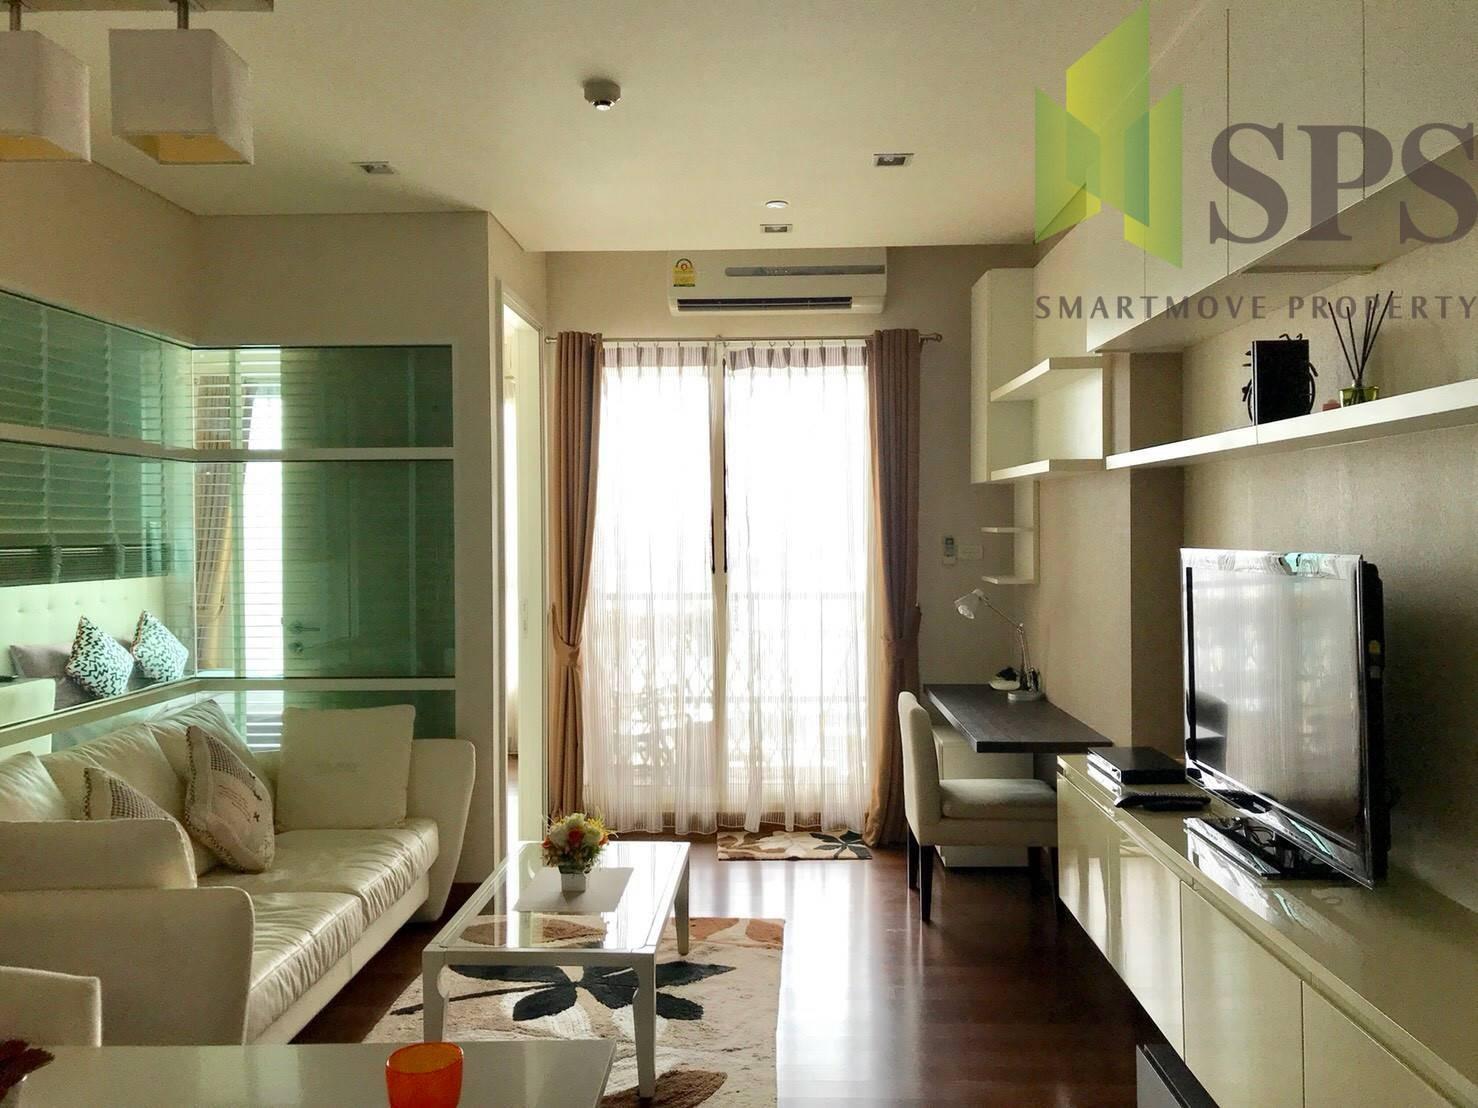 IVY Thong lor 1 bedroom for RENT (SPSP203)